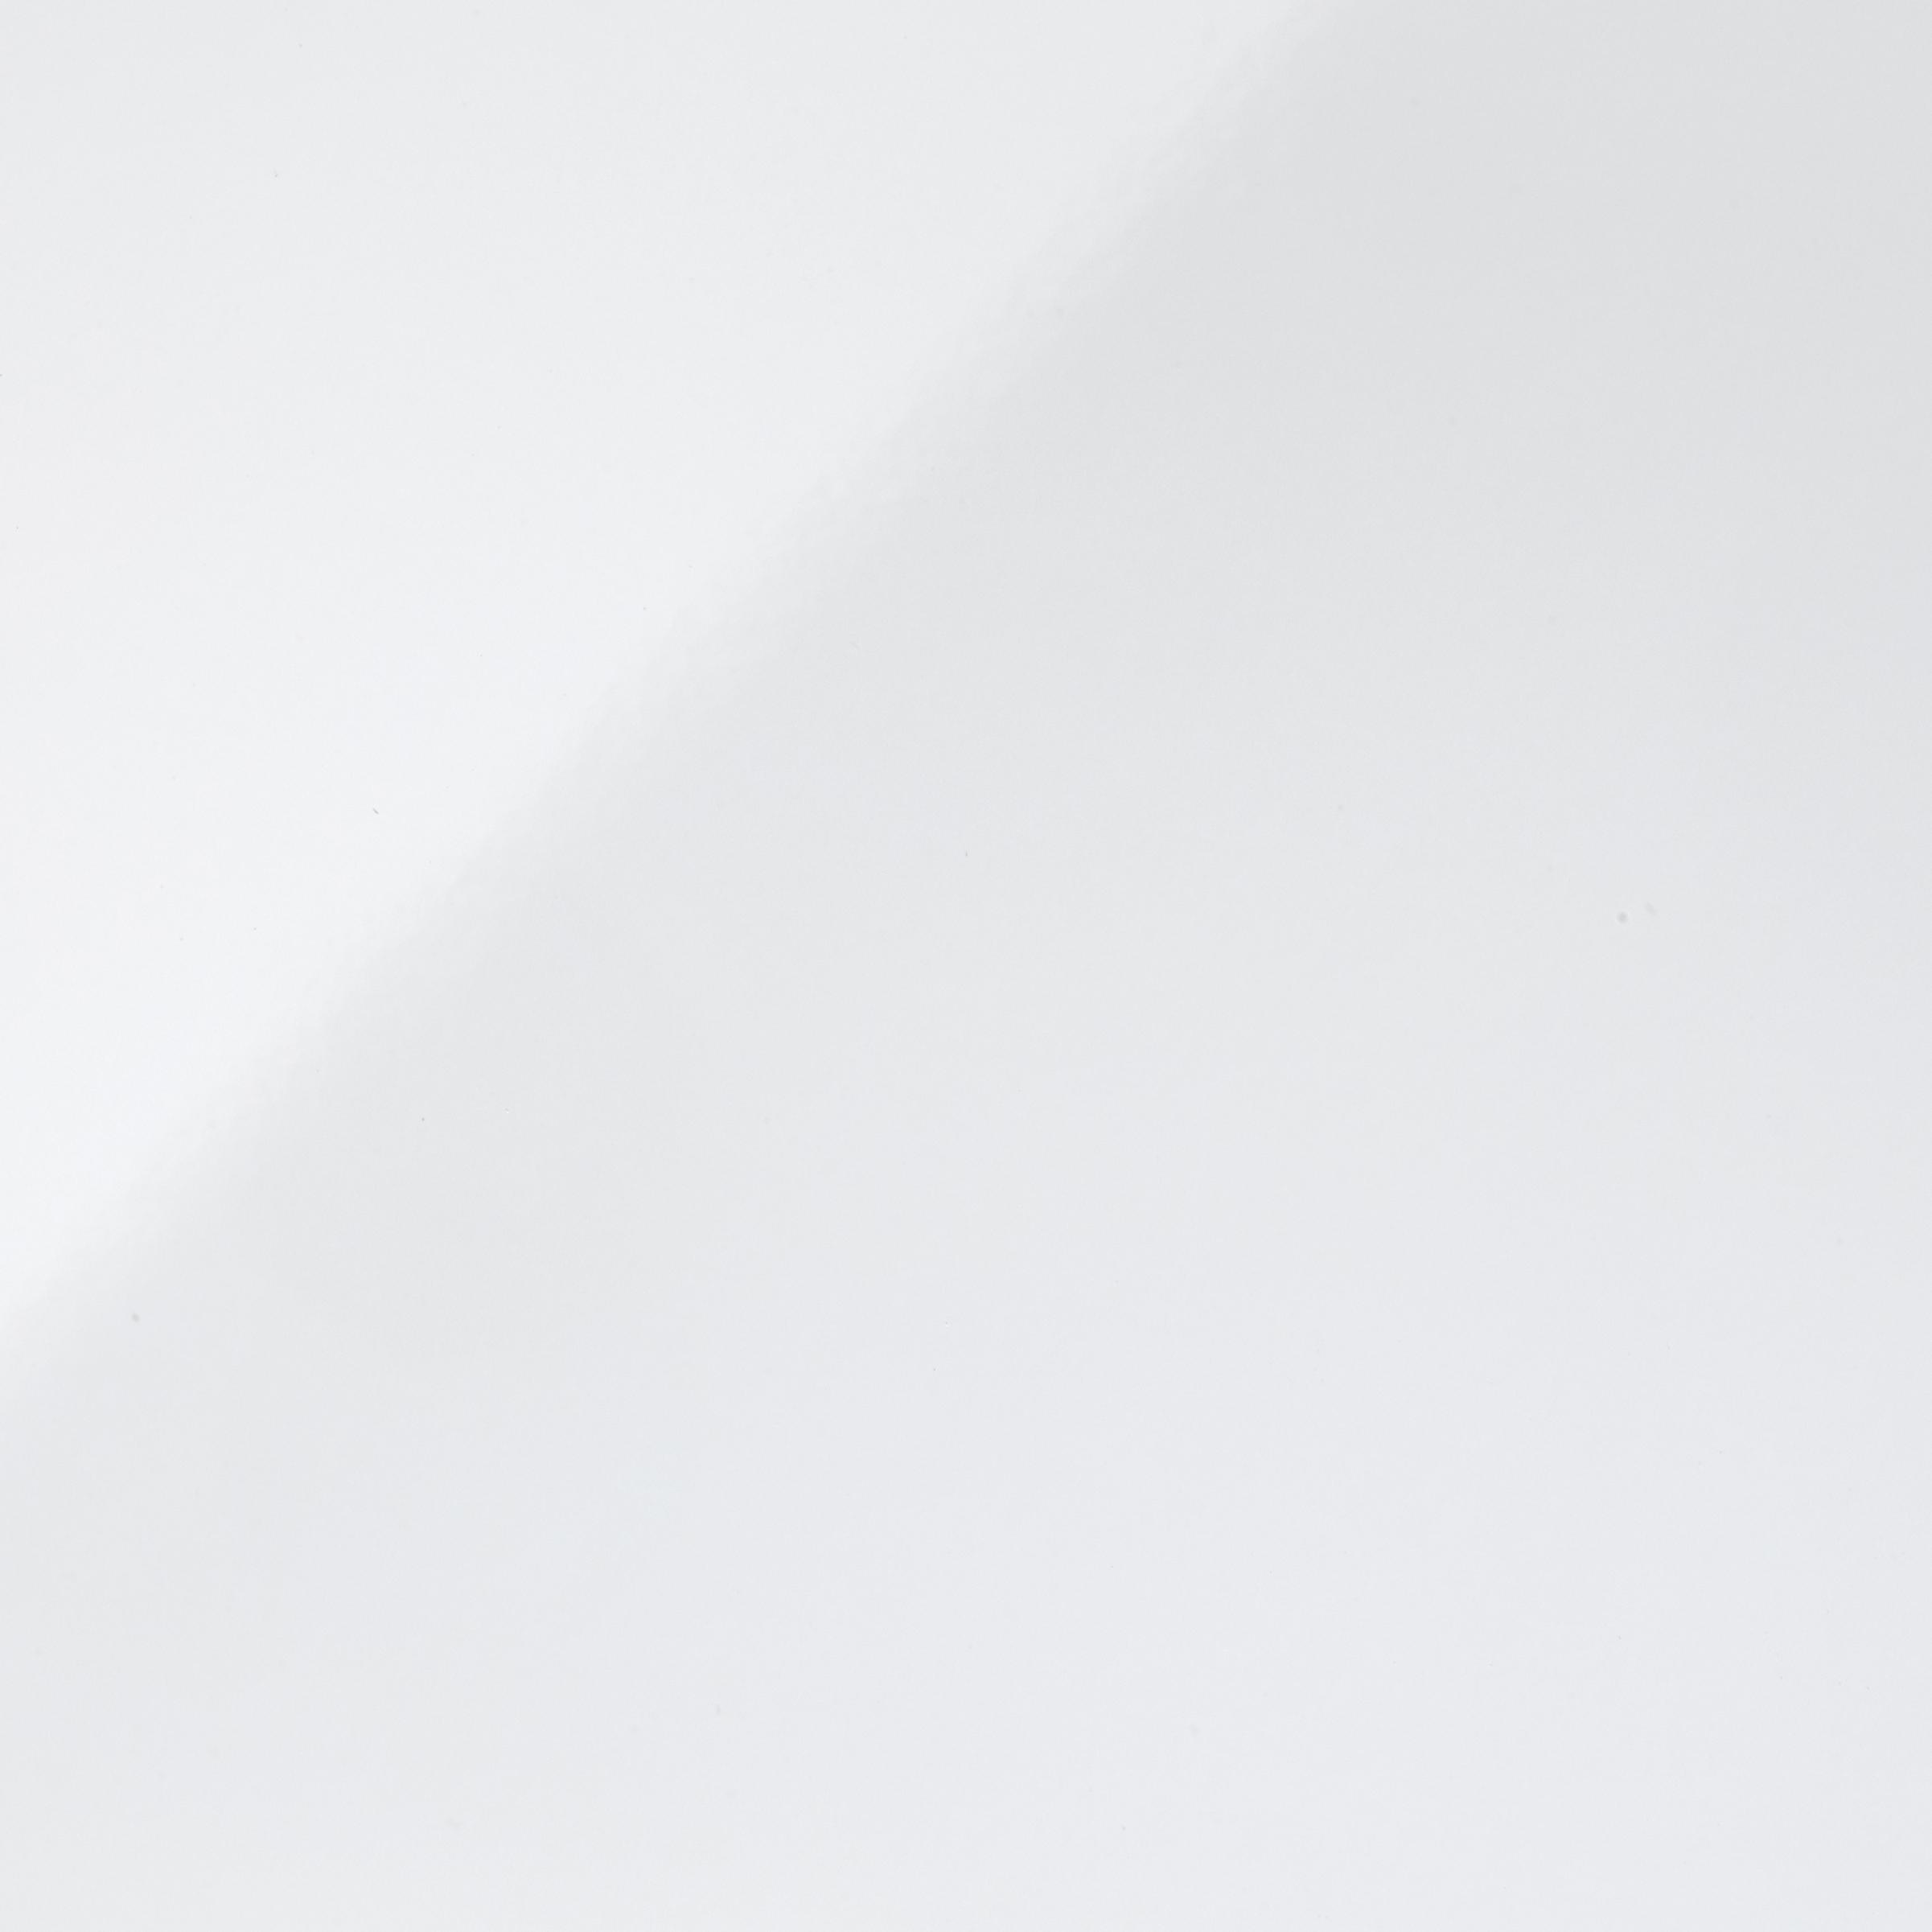 (8760) Weiß Hochglanz Lack / PG2